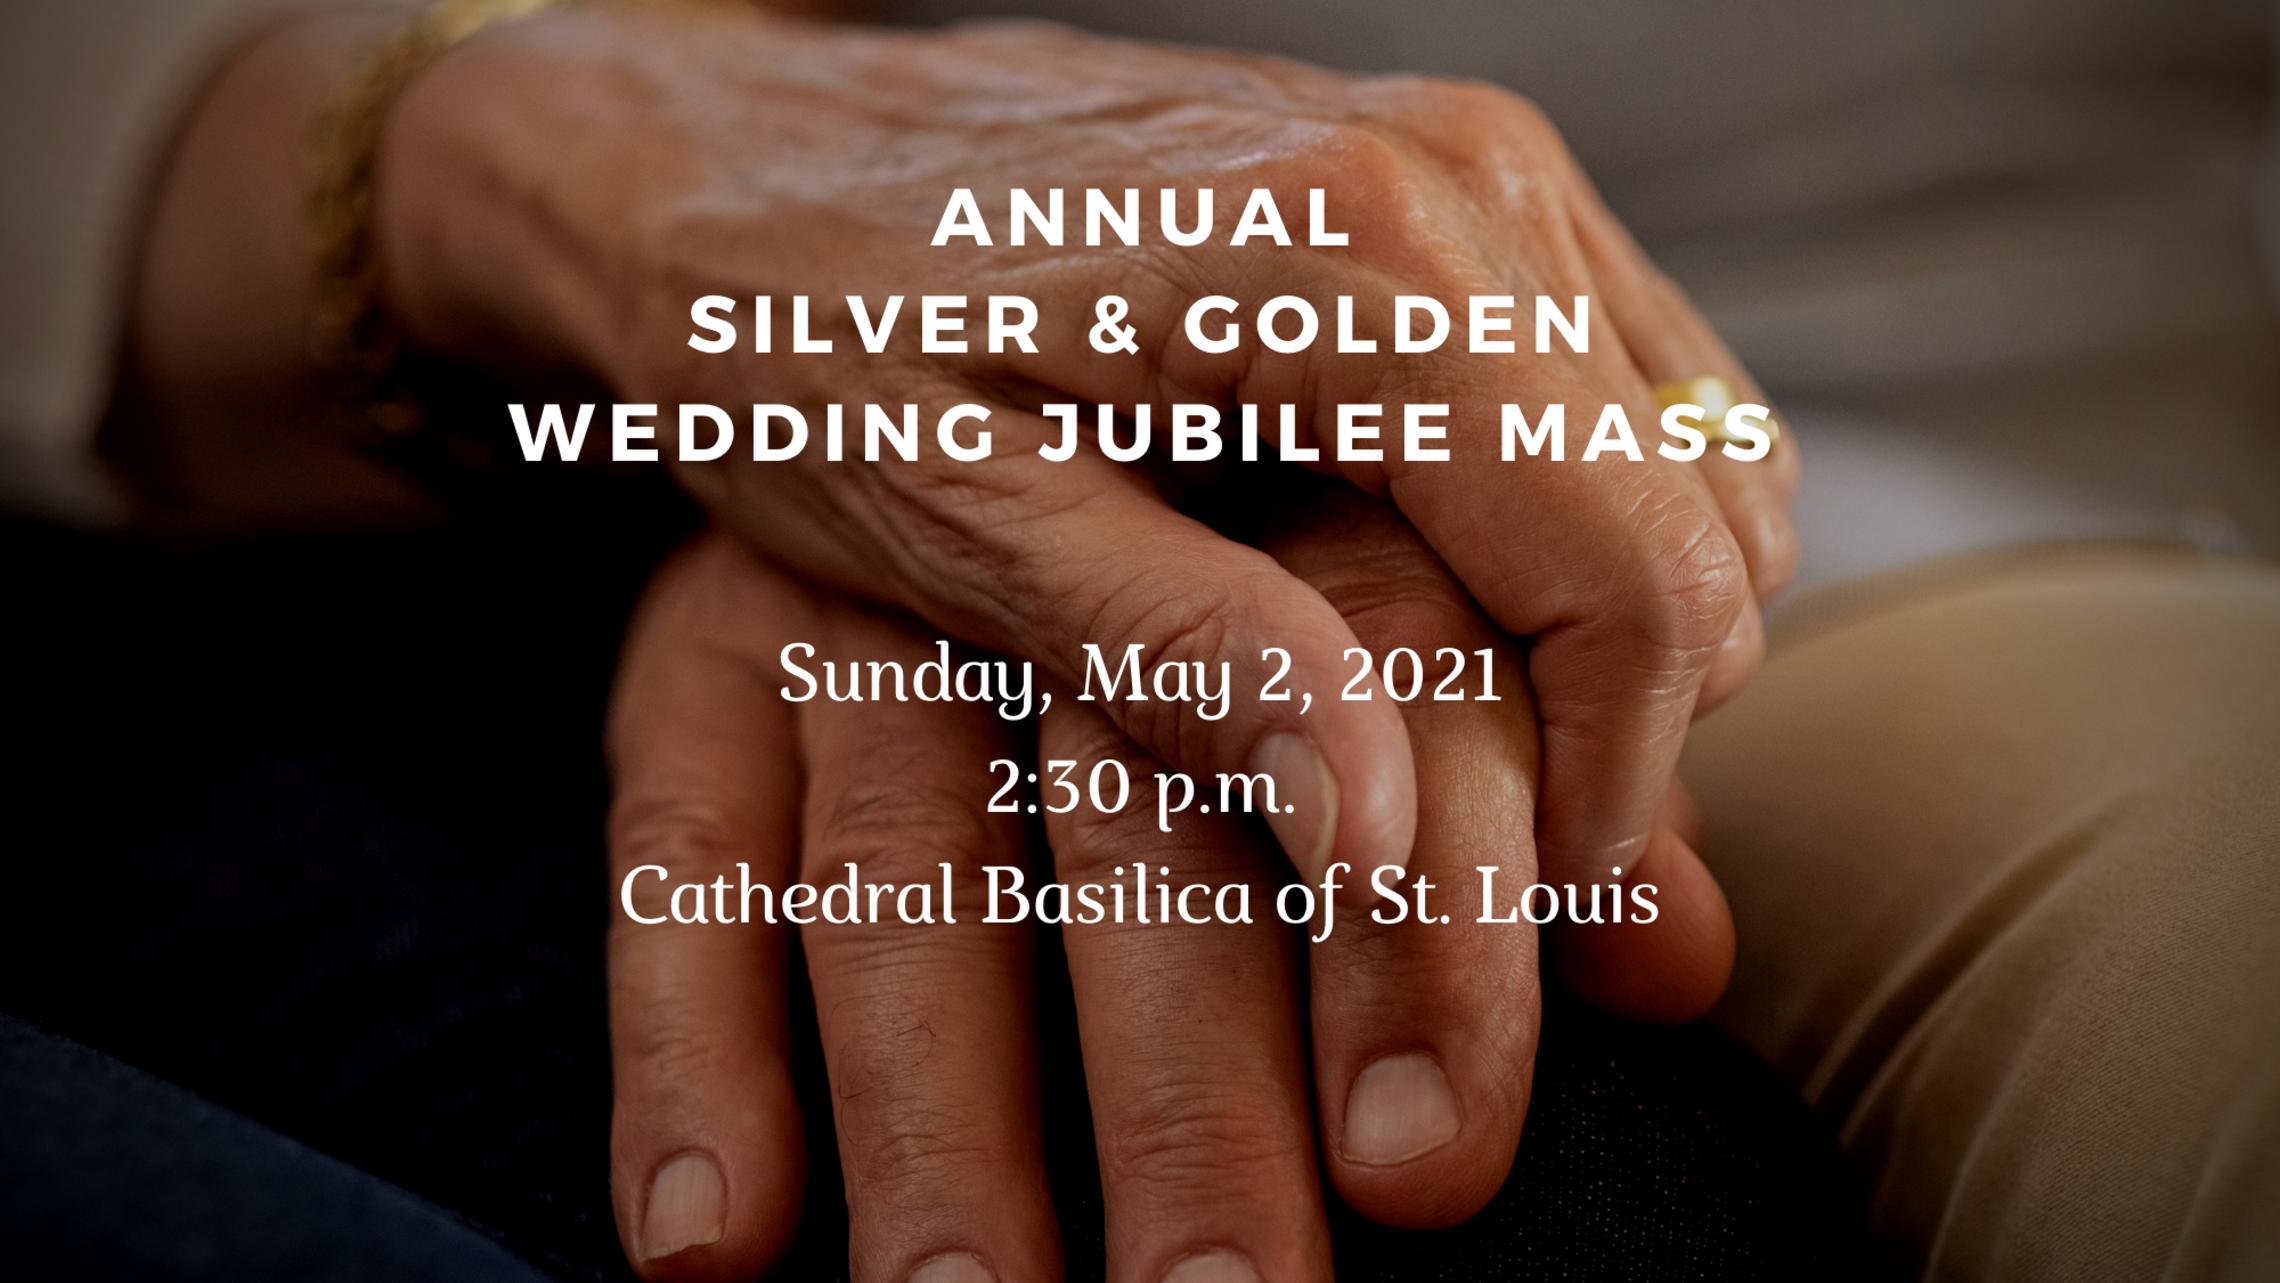 Annual Wedding Jubilee Mass